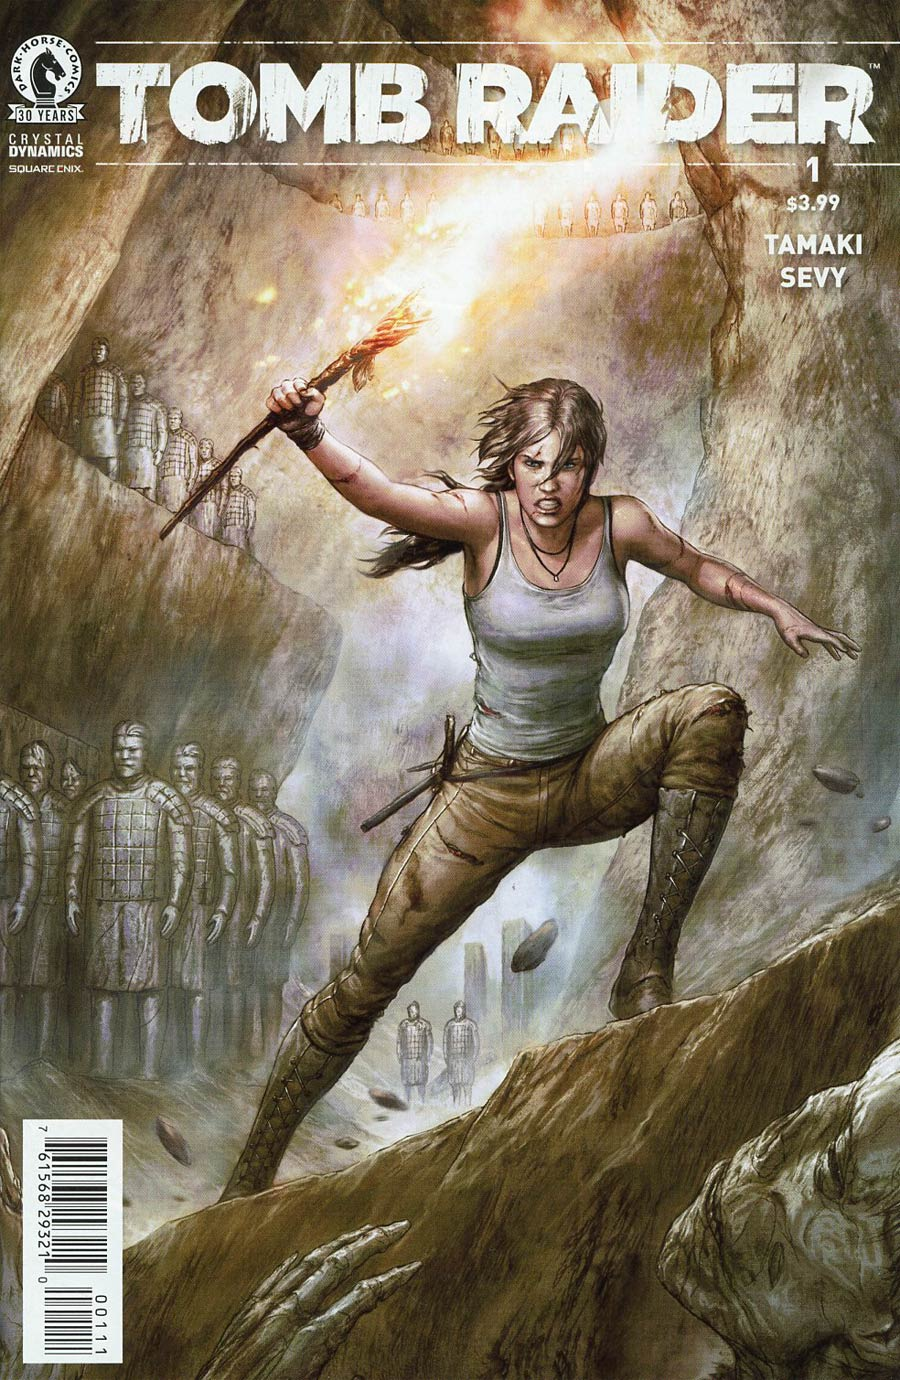 Tomb Raider Vol 3 #1 Cover A Regular Agustin Alessio Cover